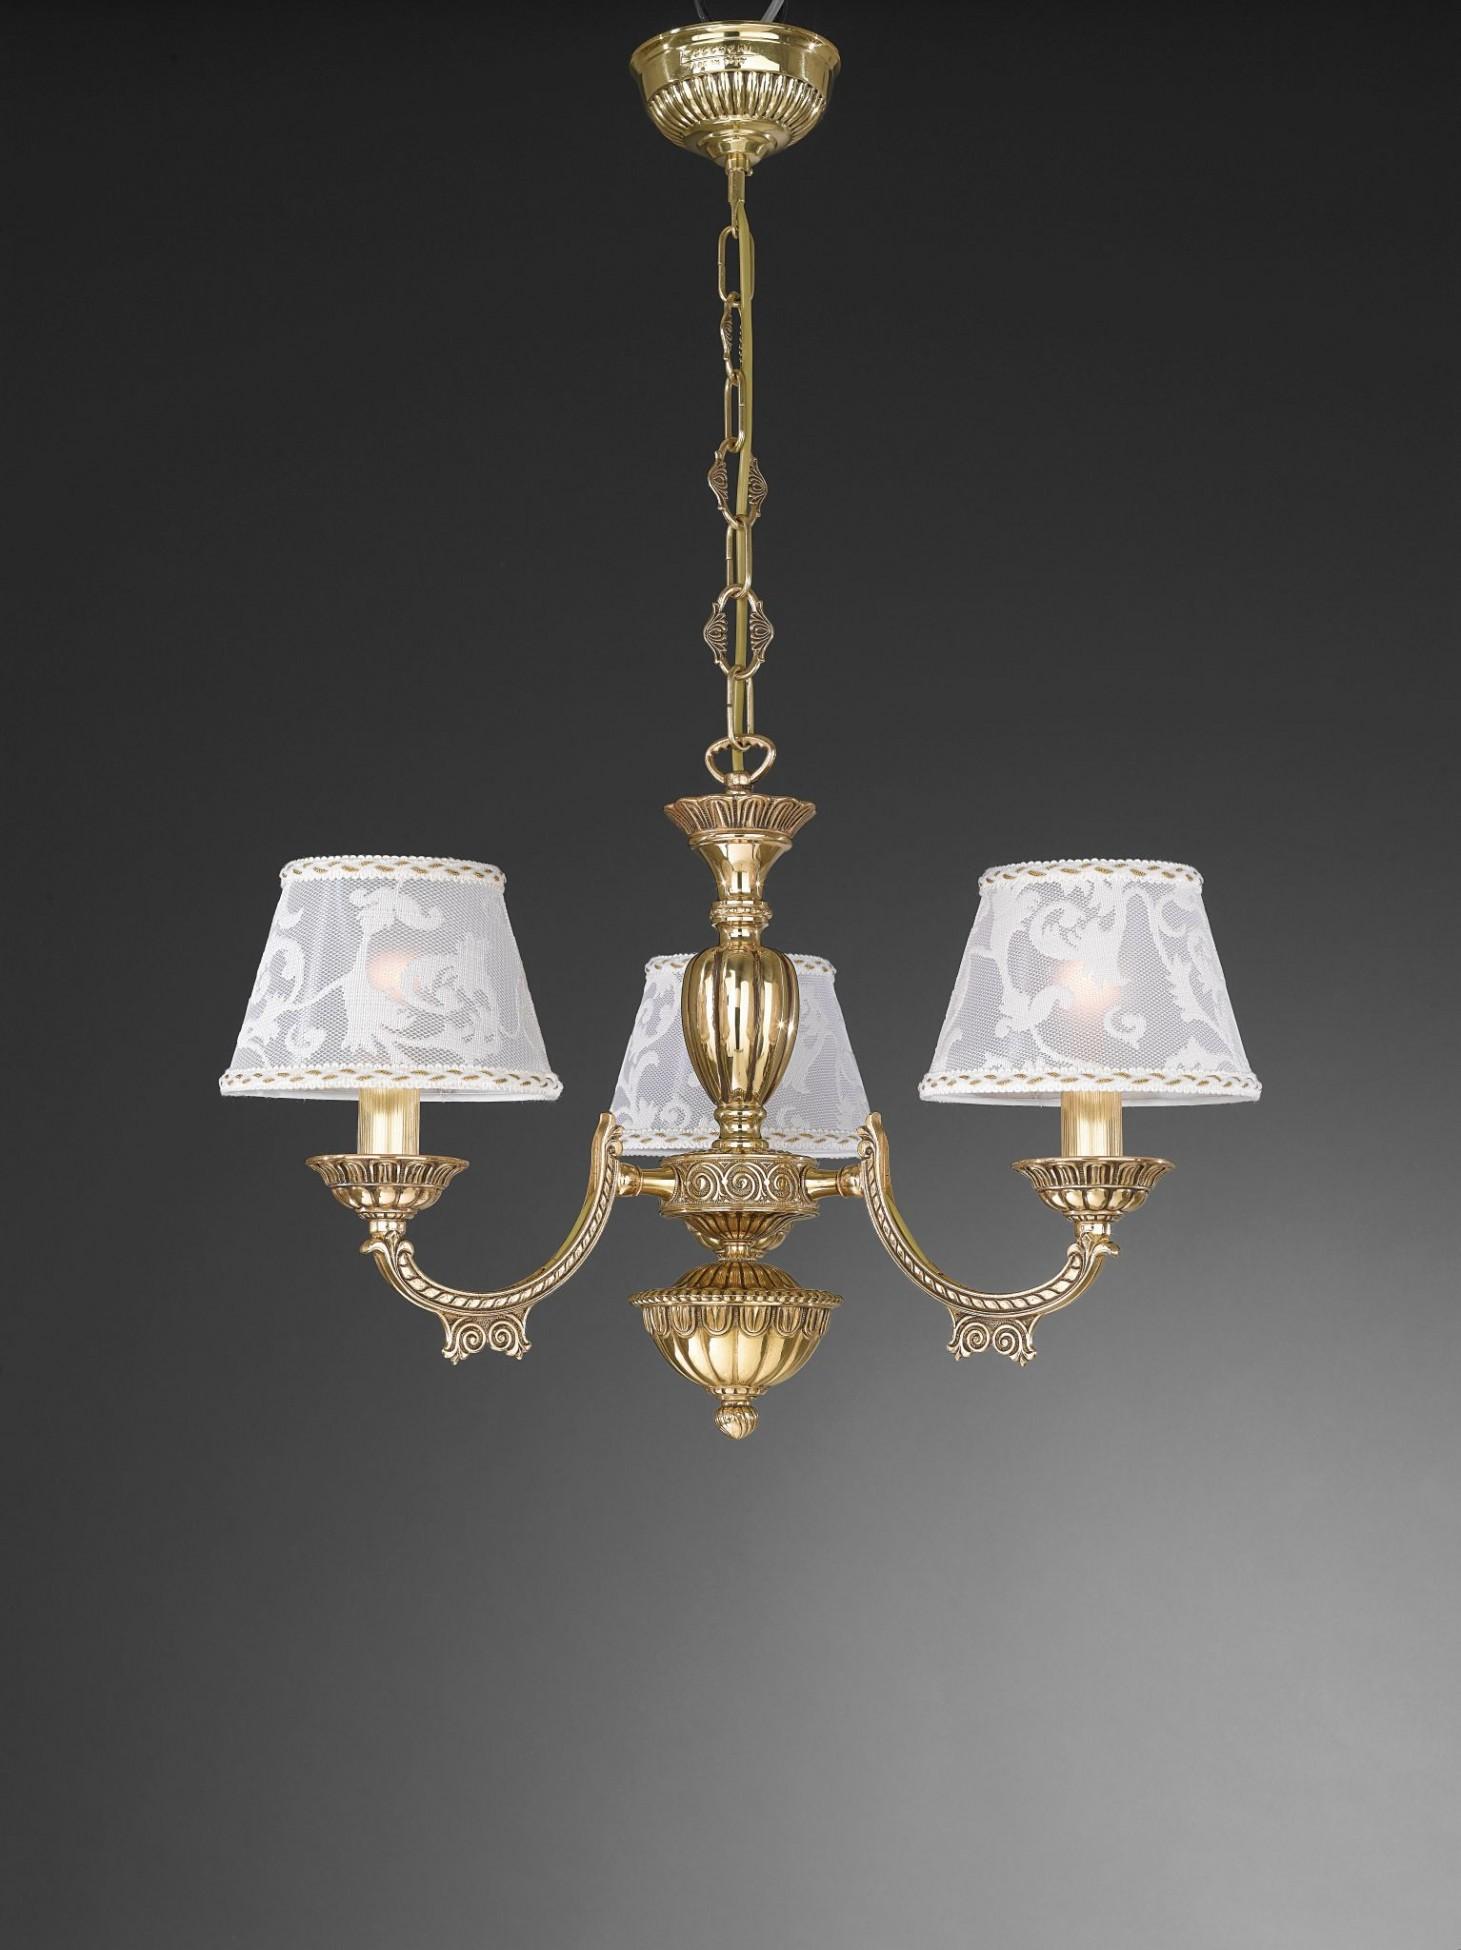 kronleuchter aus goldenen messing mit lampenschirm 3 flammig reccagni store. Black Bedroom Furniture Sets. Home Design Ideas